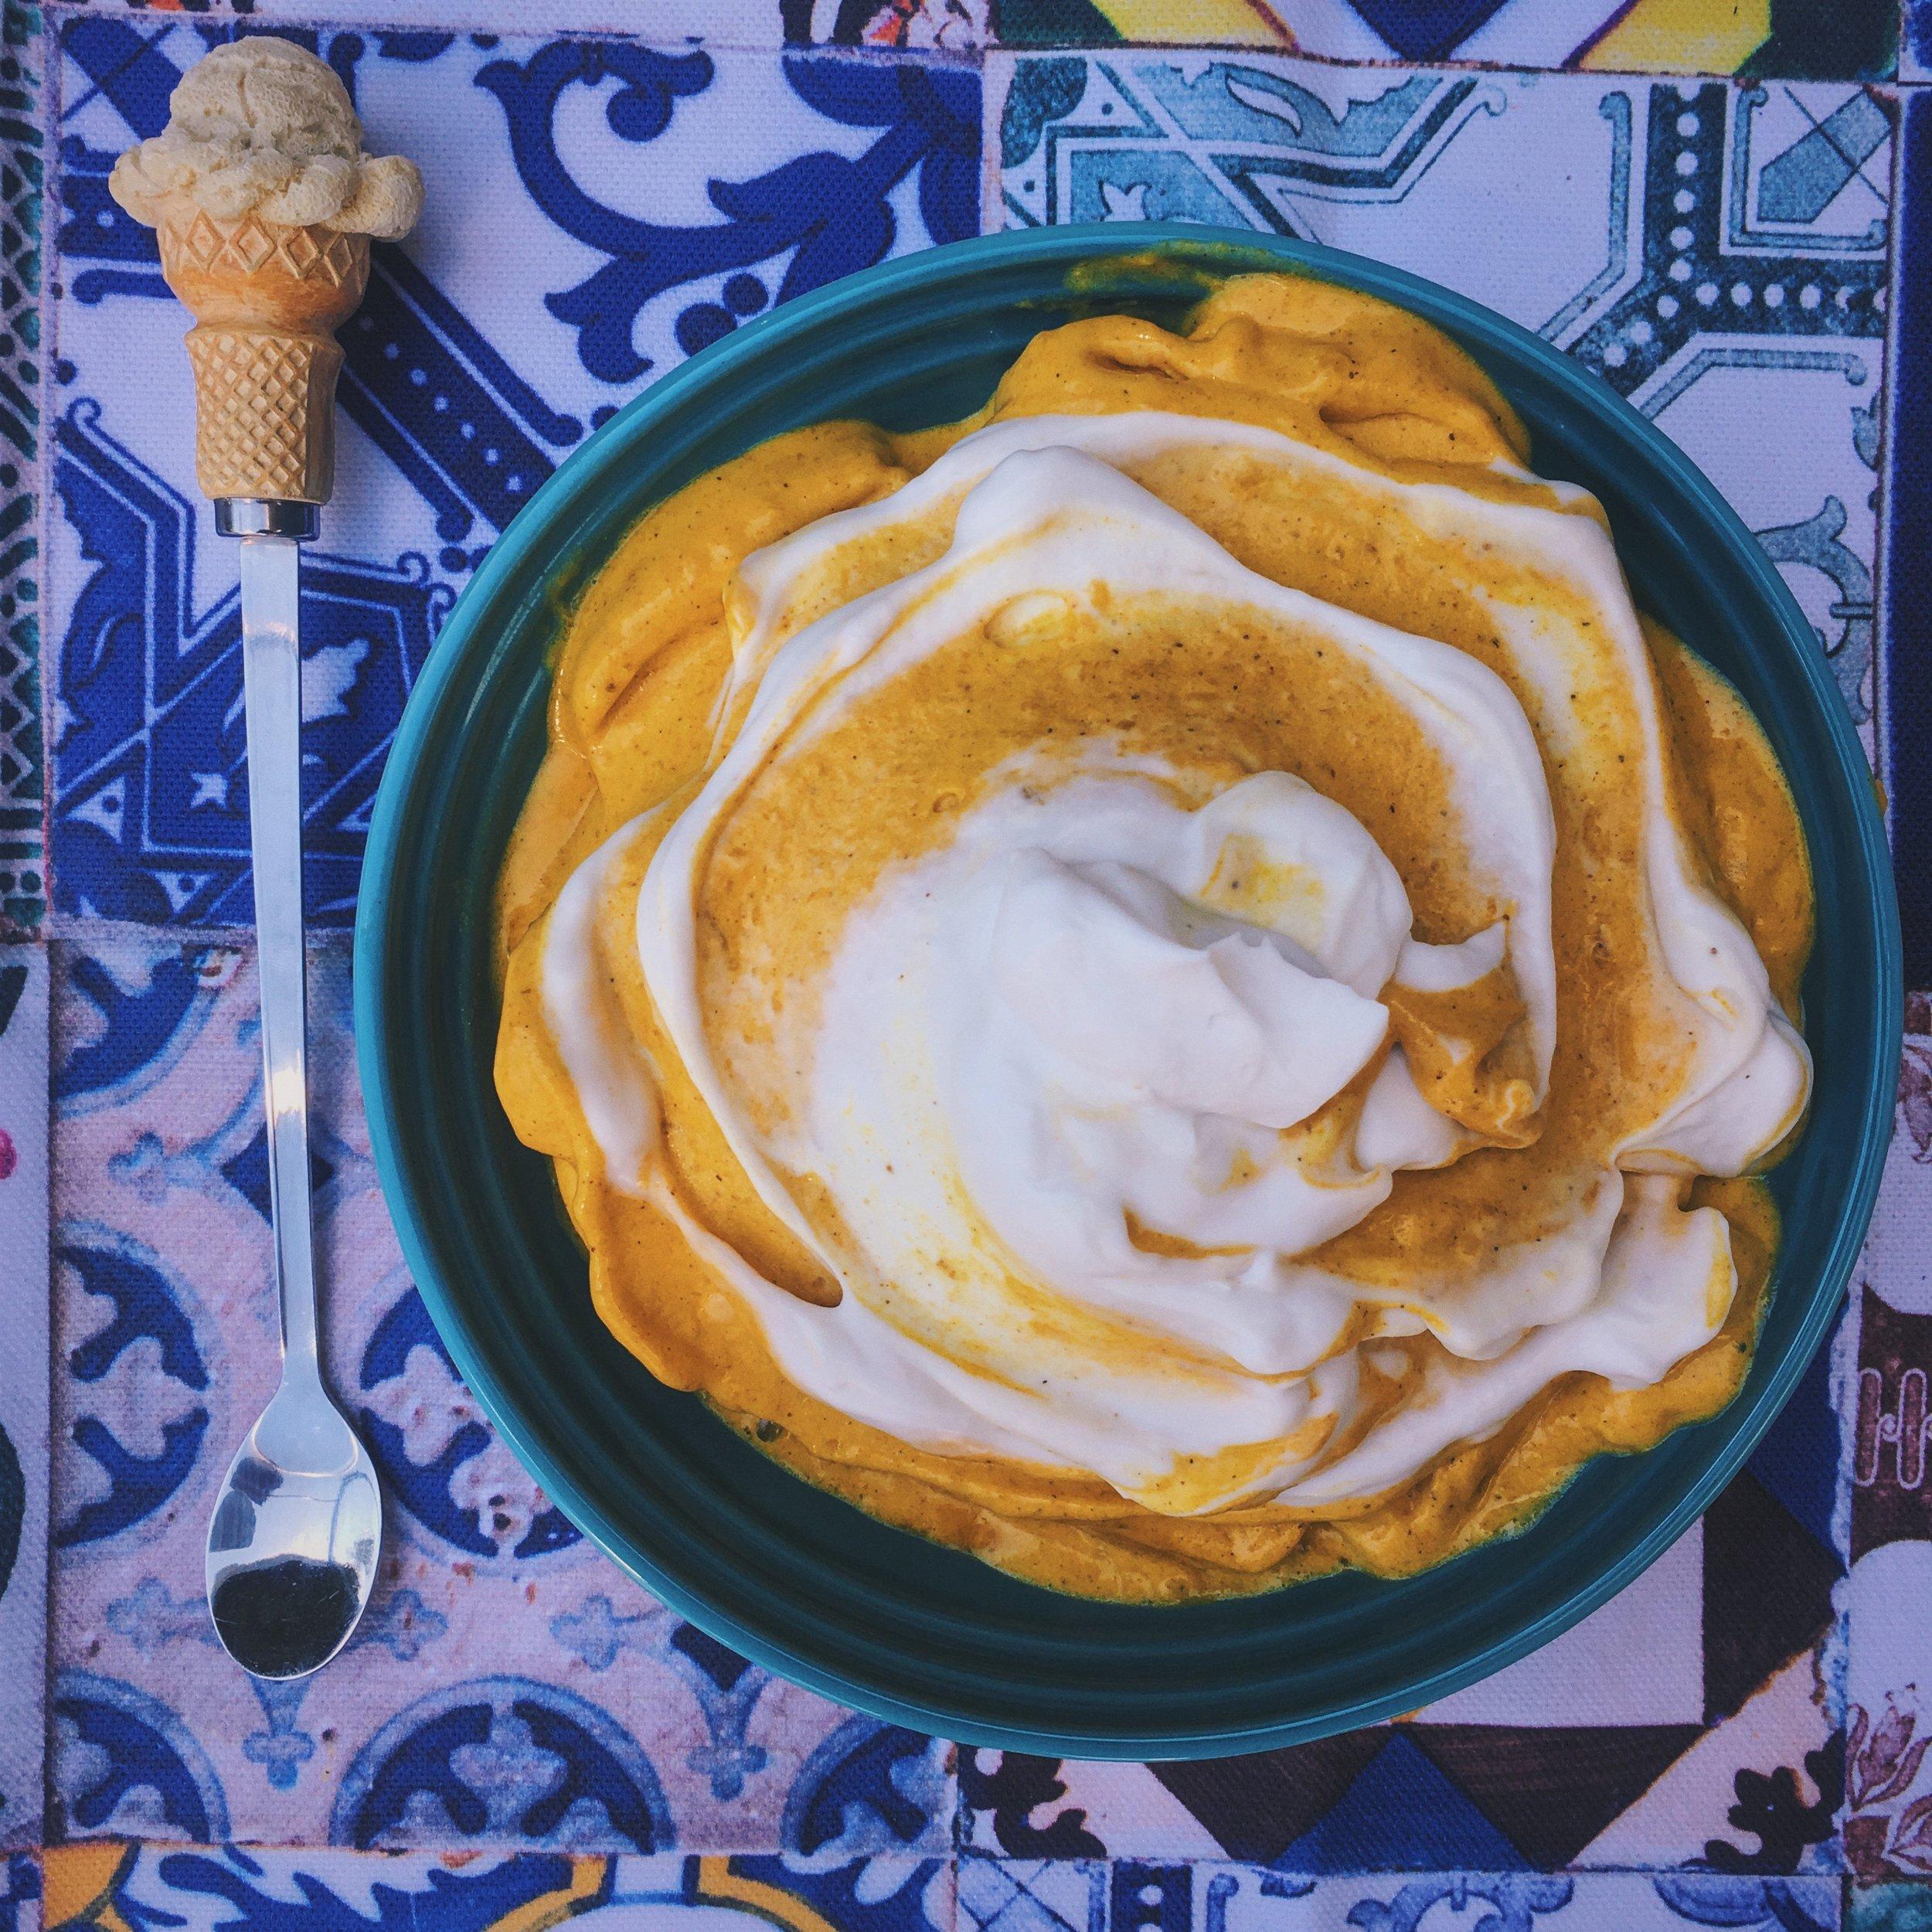 healthy vegan frozen banana ice cream made with turmeric, coconut yoghurt, maca and cinnamon